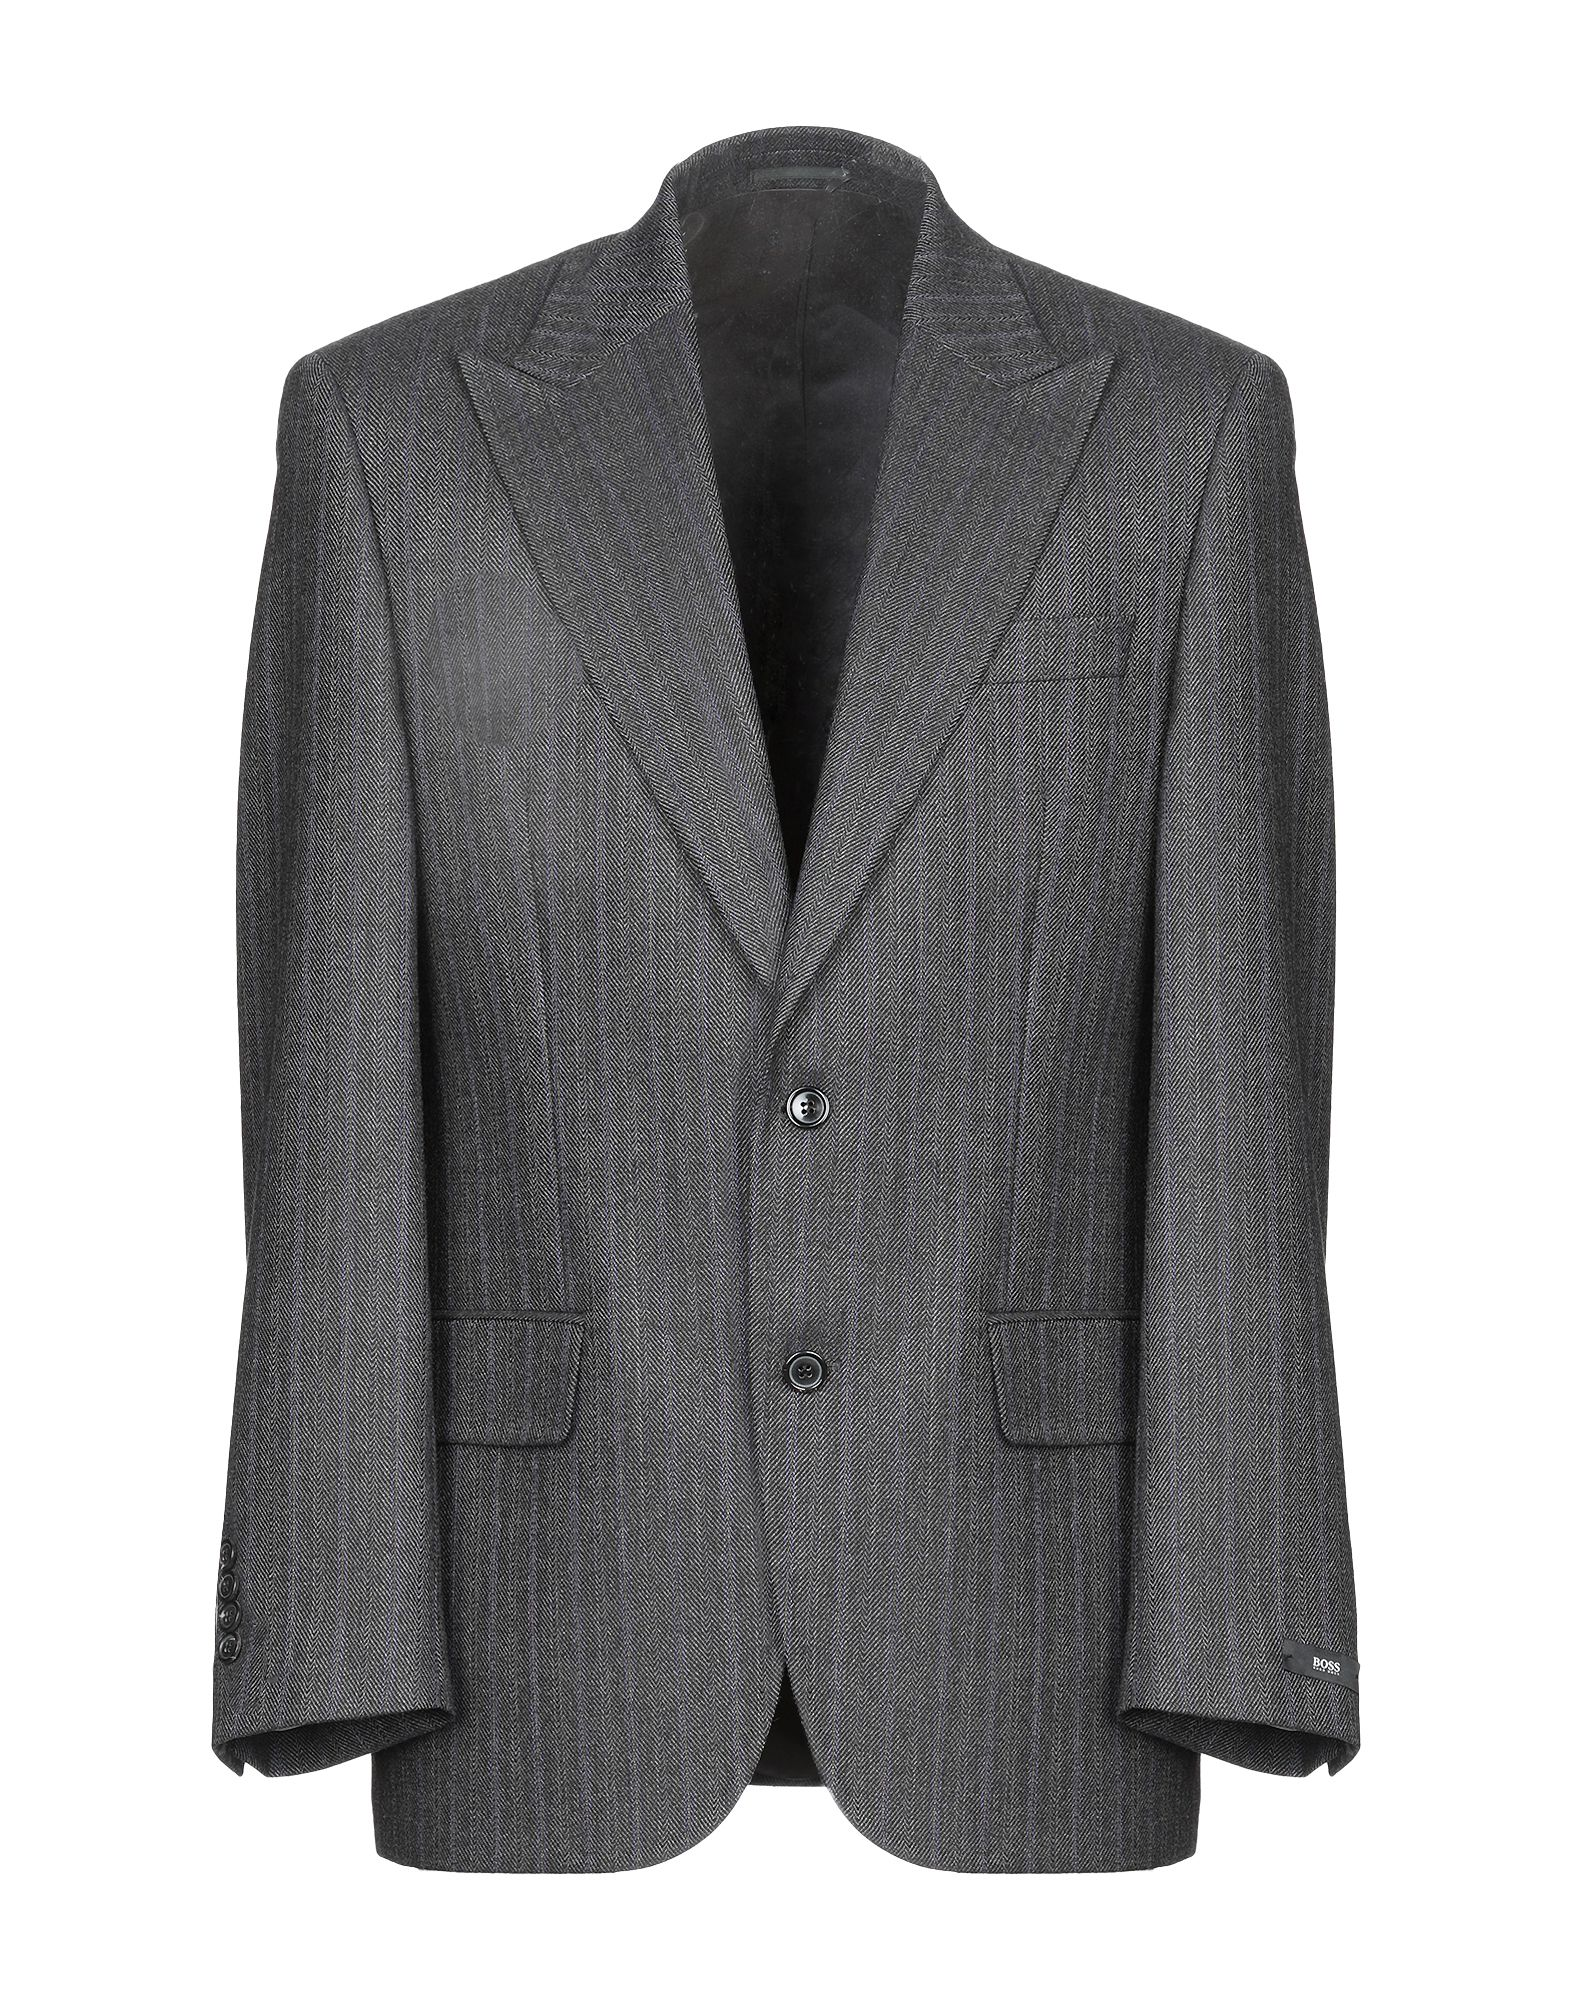 Giacca Boss Hugo Boss uomo - 49442905JA 49442905JA